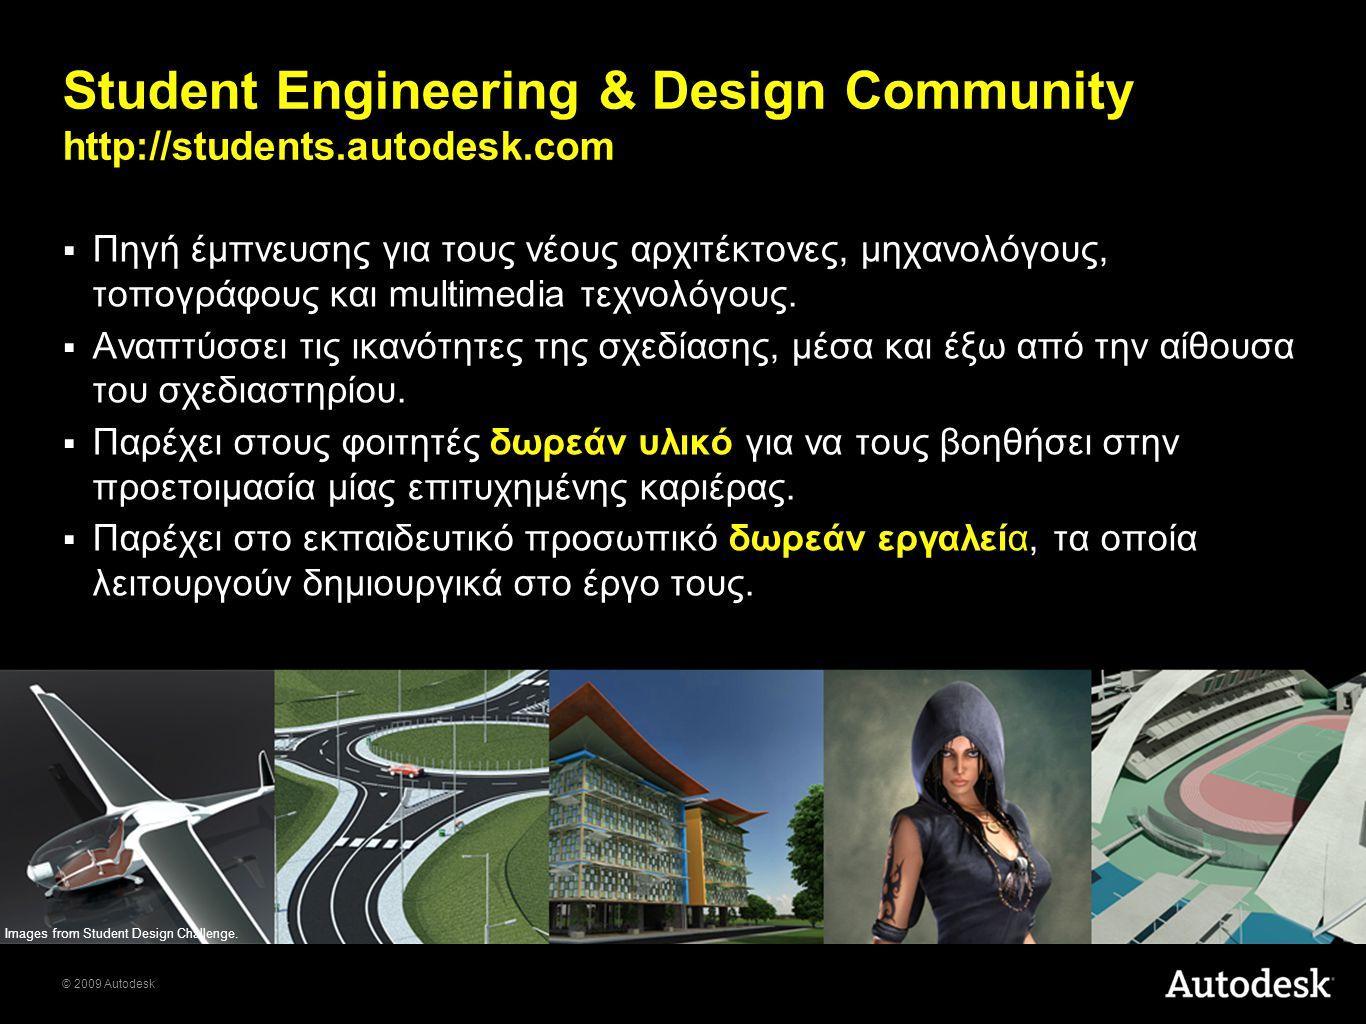 © 2009 Autodesk Student Engineering & Design Community http://students.autodesk.com  Πηγή έμπνευσης για τους νέους αρχιτέκτονες, μηχανολόγους, τοπογράφους και multimedia τεχνολόγους.